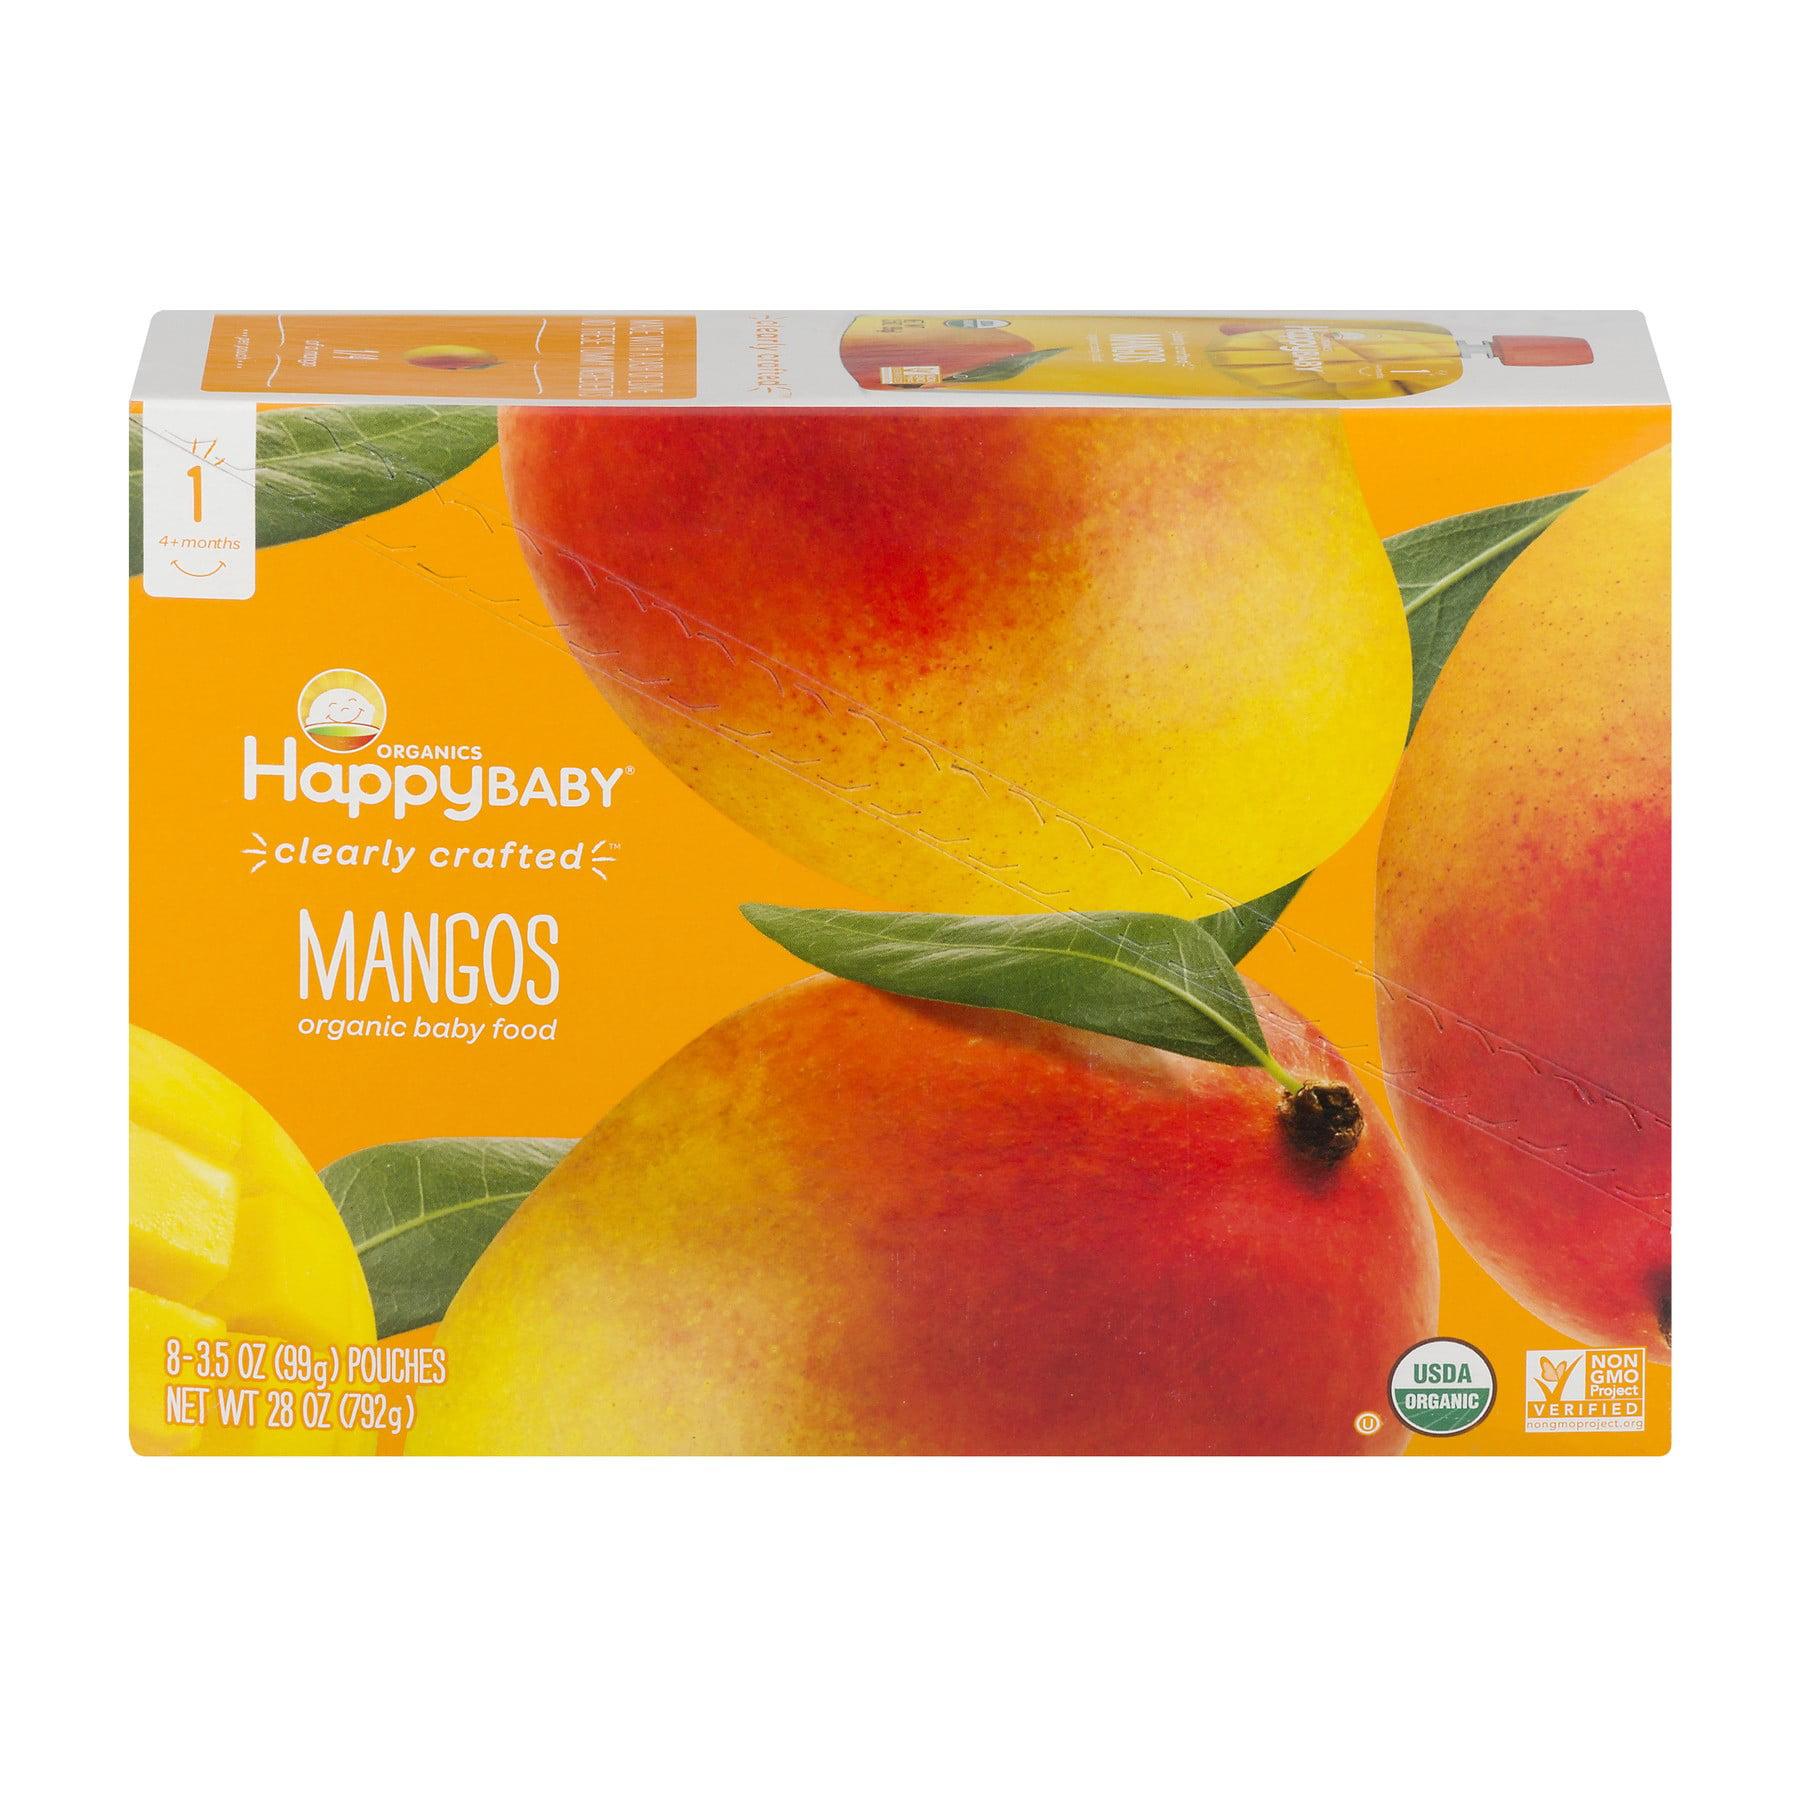 Happy Baby Organics Mangos Baby Food 8-3.5 oz. Pouches